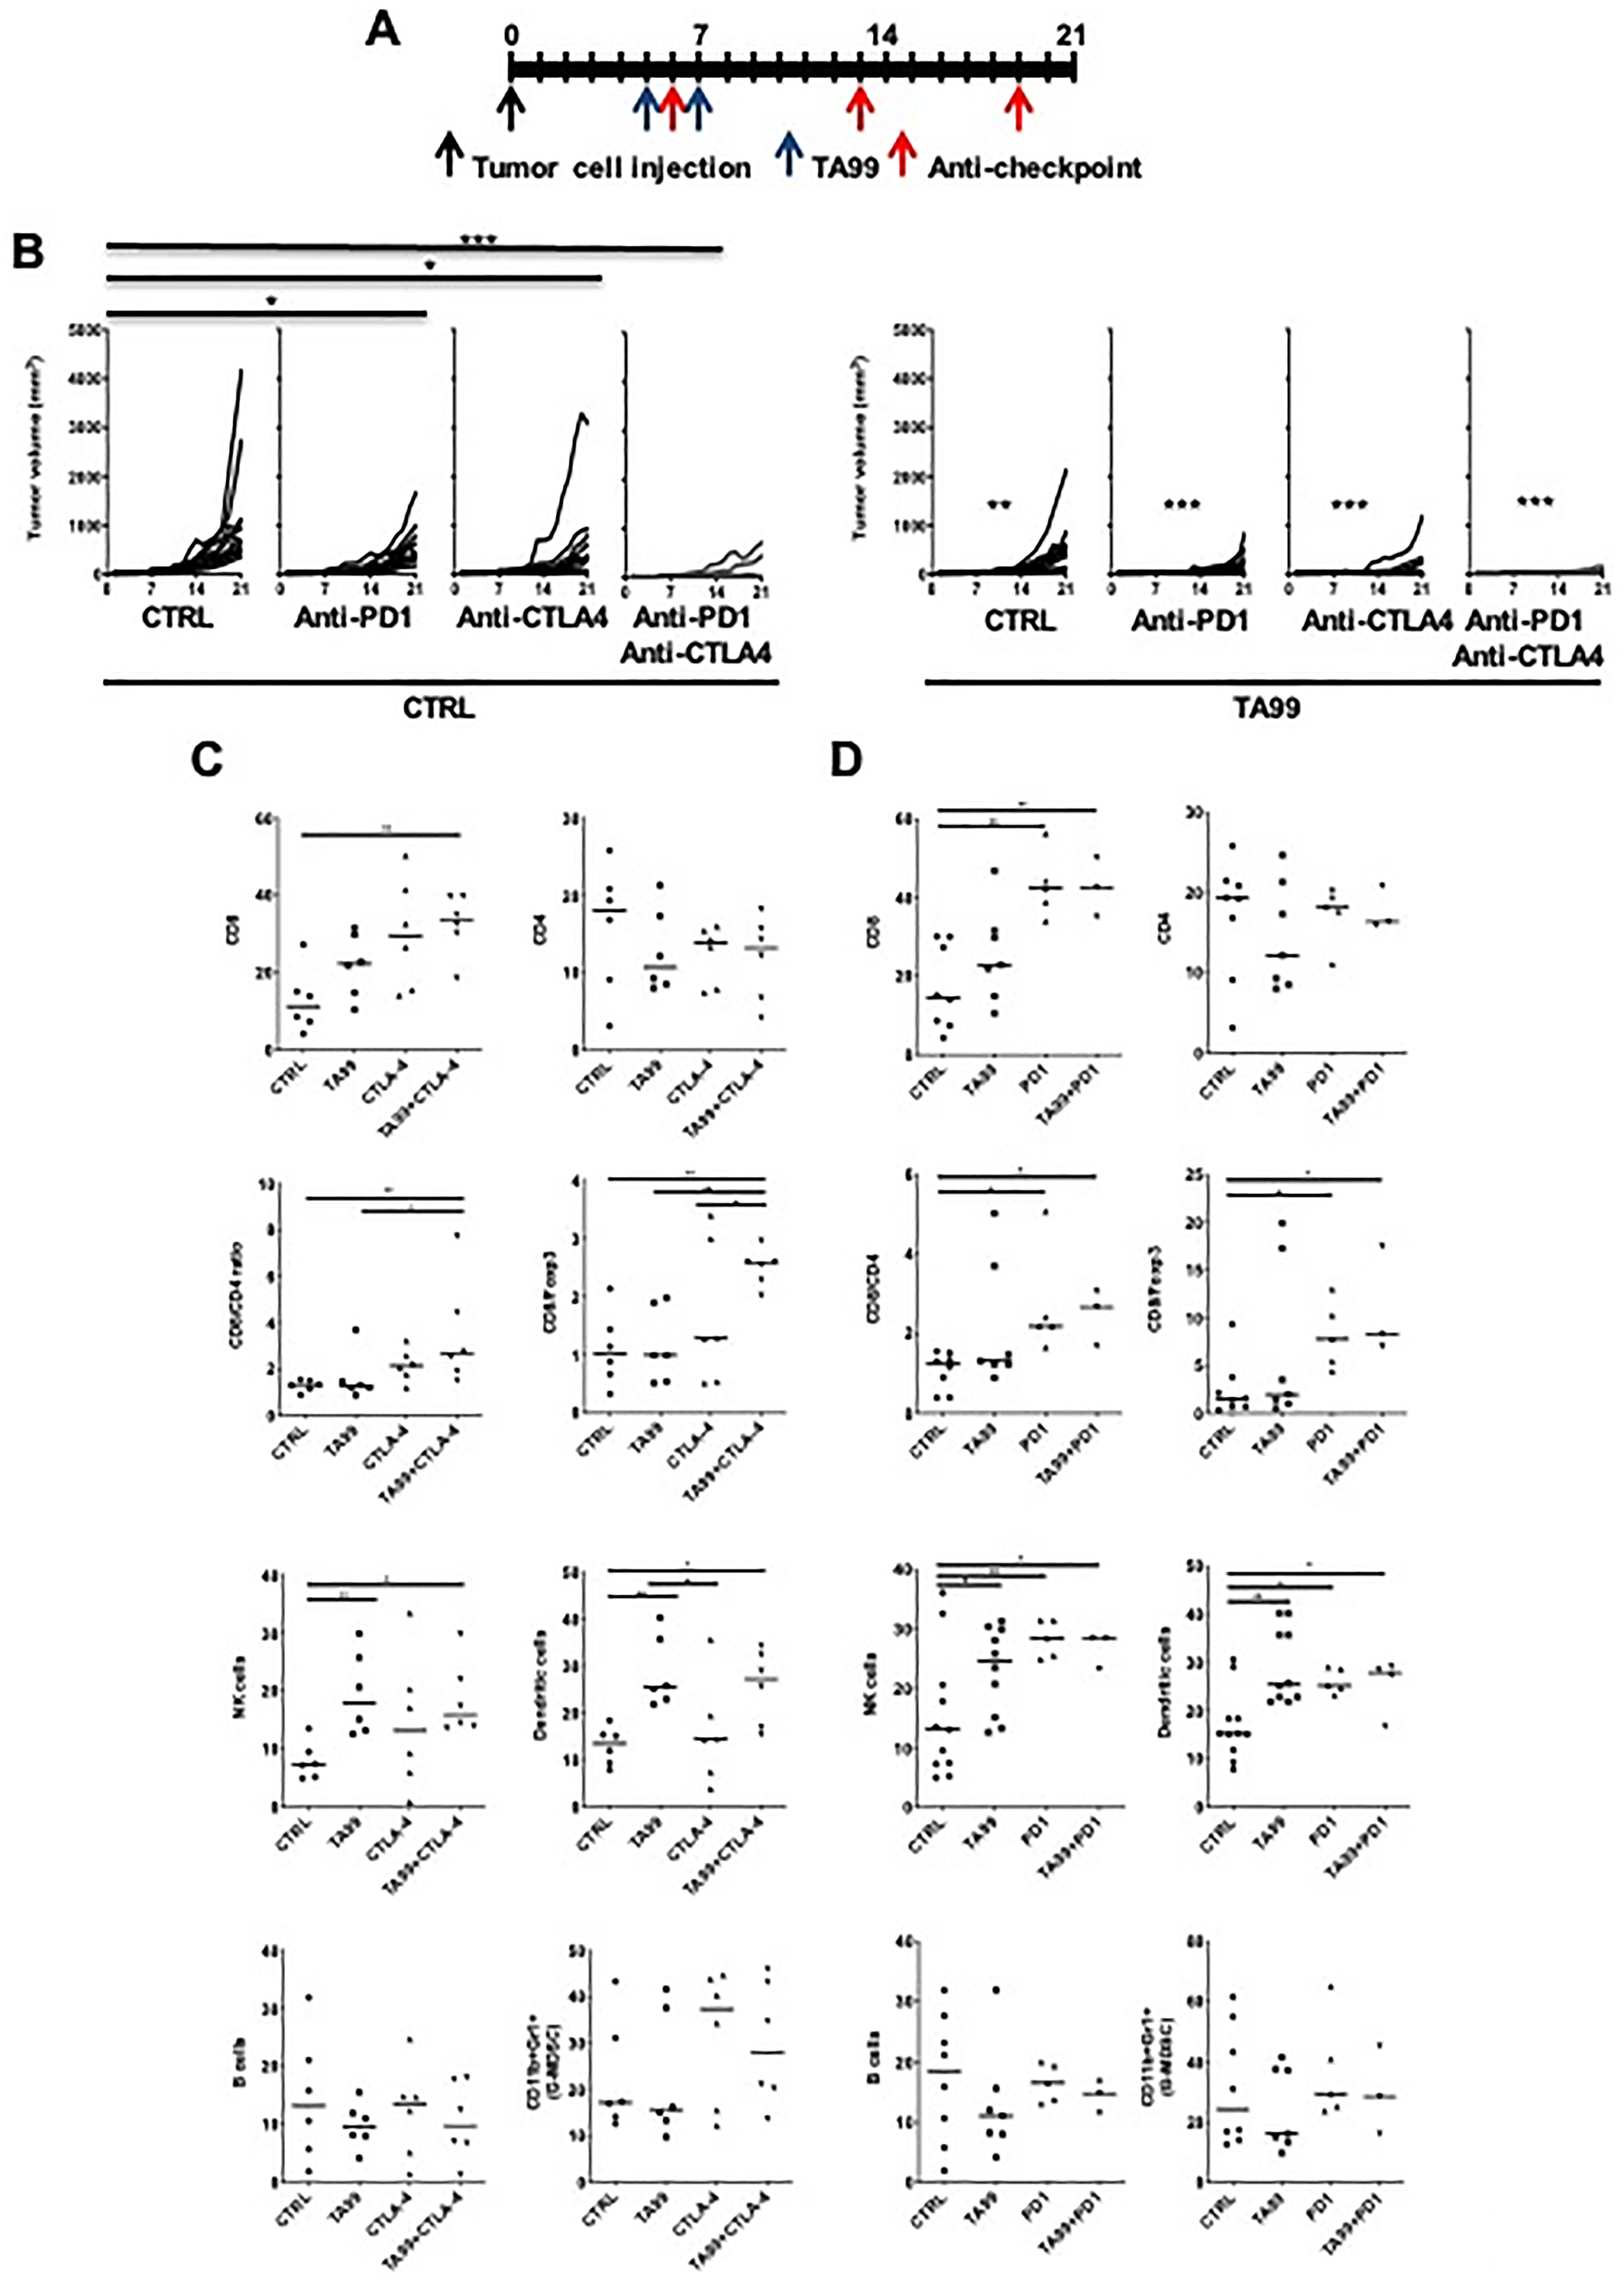 ICB enhanced the anti-tumor efficacy of TA99 in B16 subcutaneous melanoma.